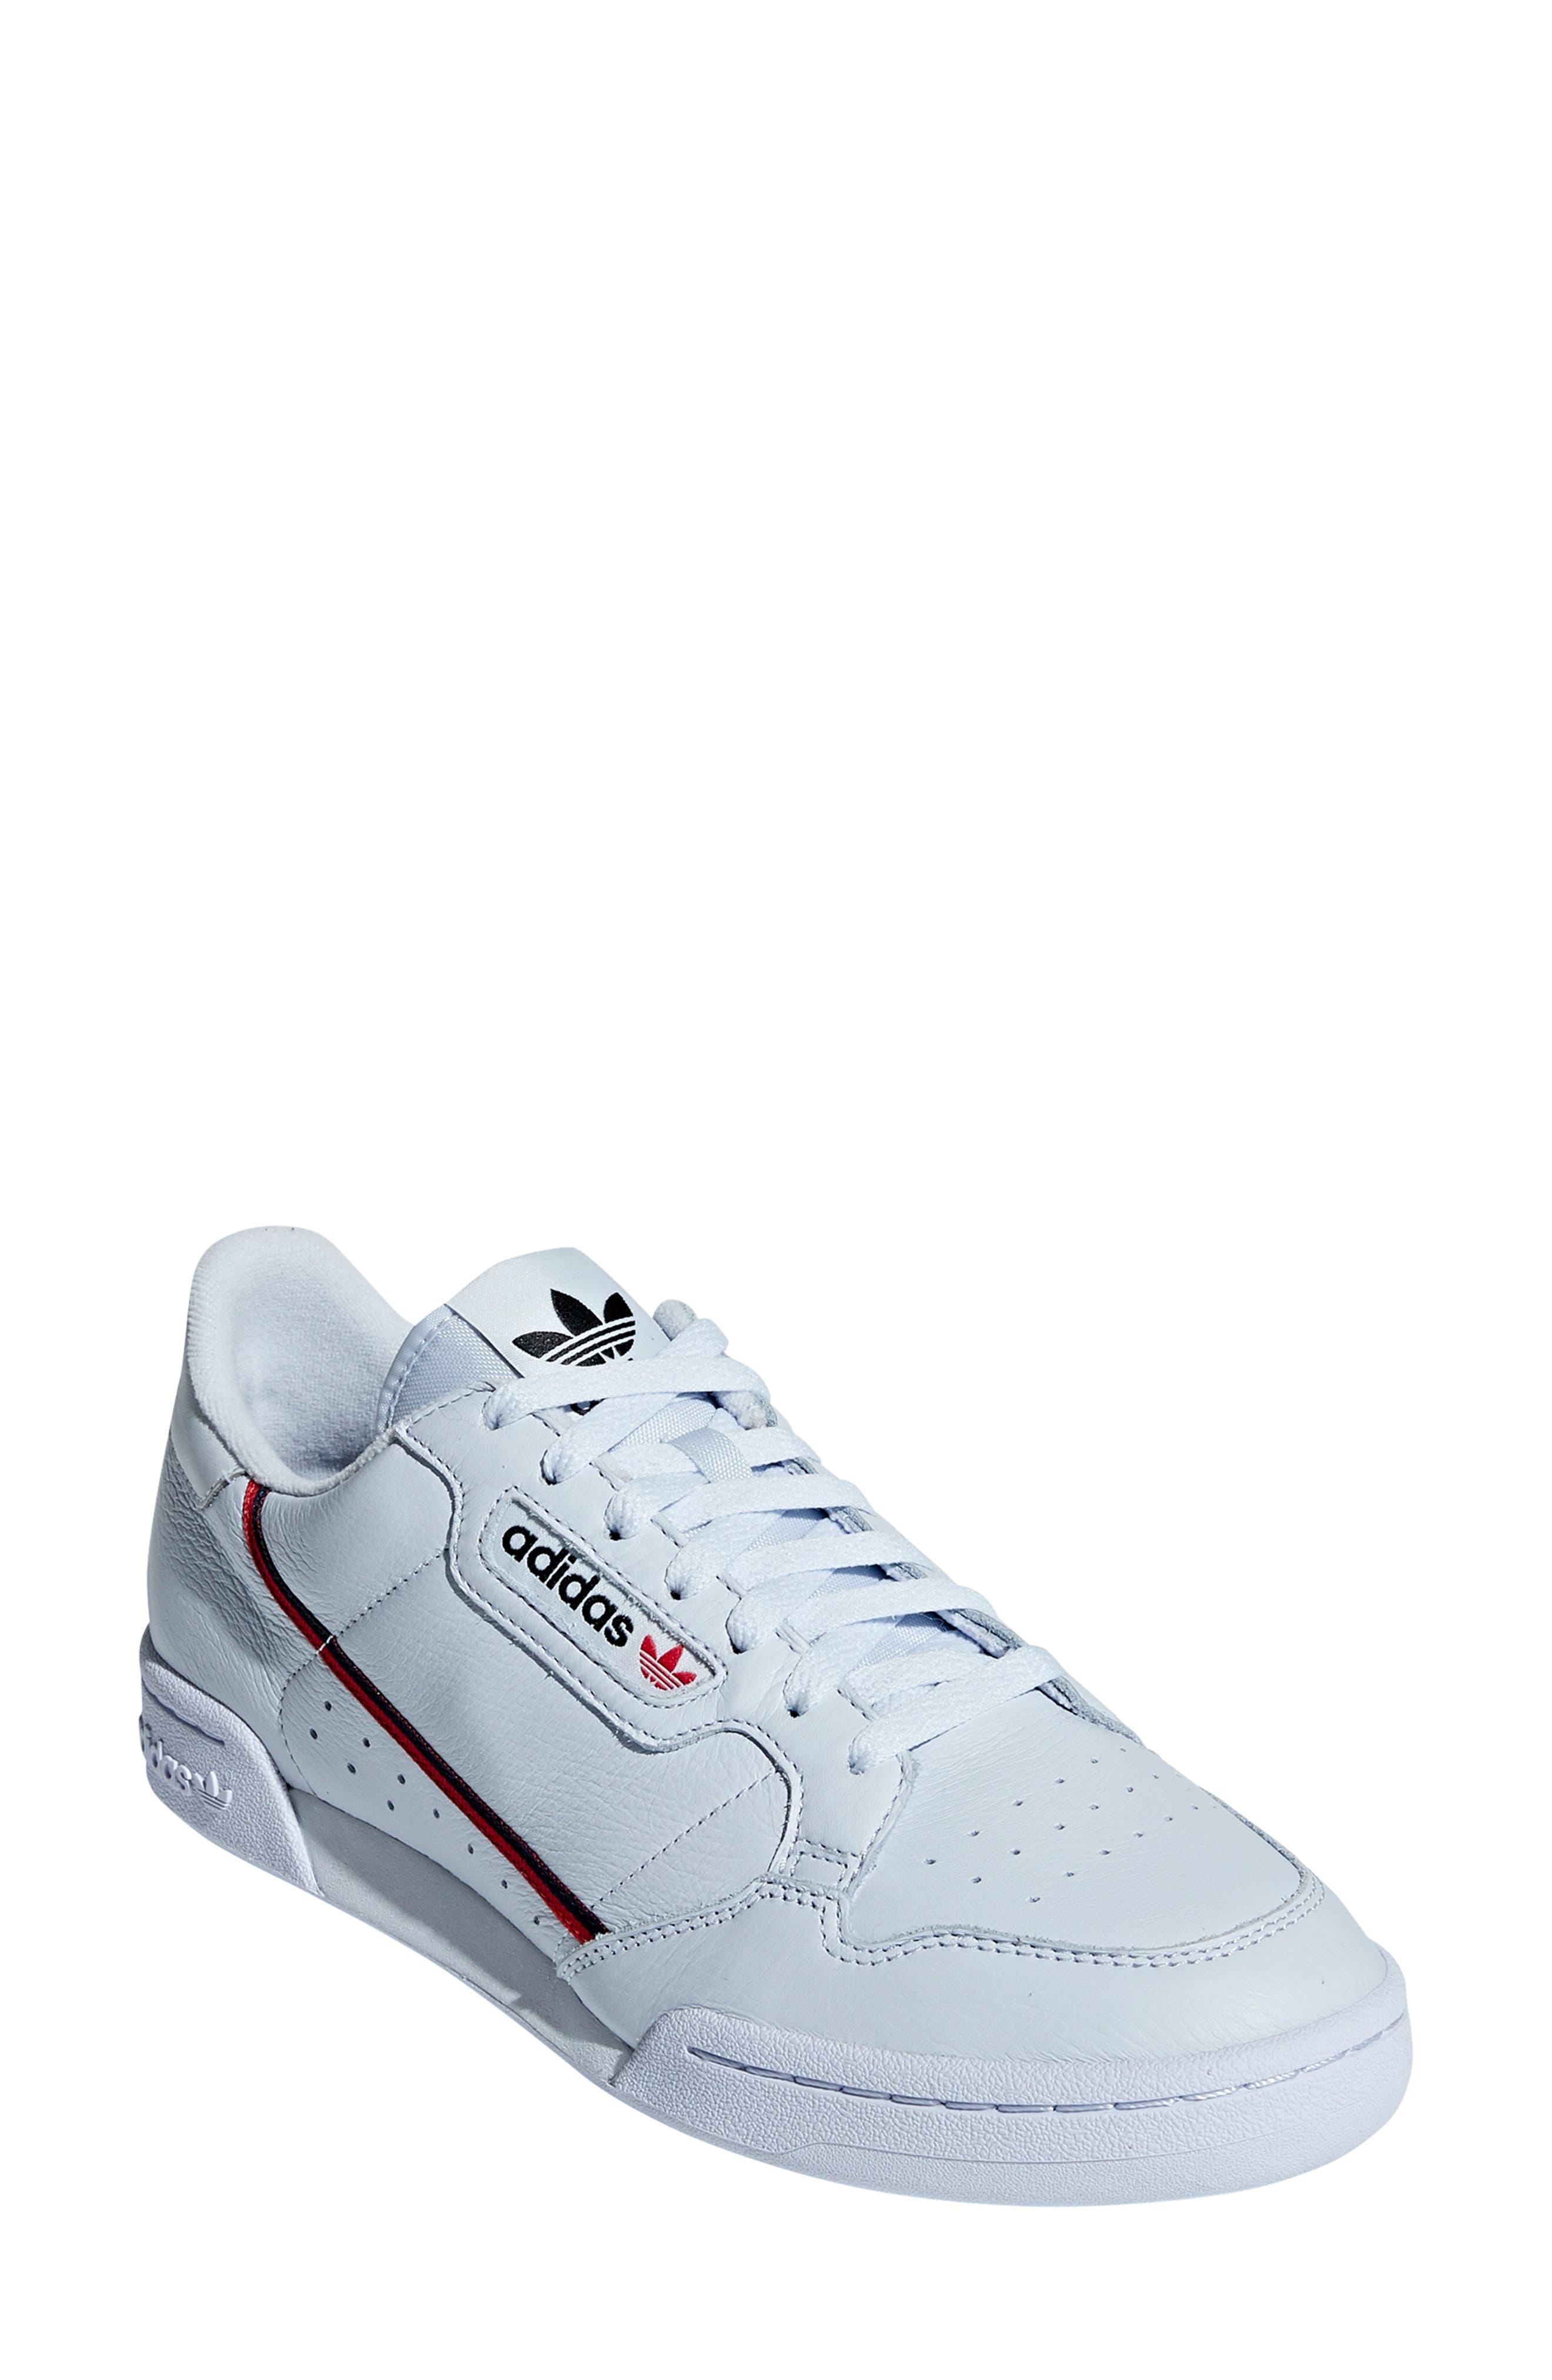 Continental 80 Sneaker,                             Main thumbnail 1, color,                             AERO BLUE/ SCARLET/ NAVY